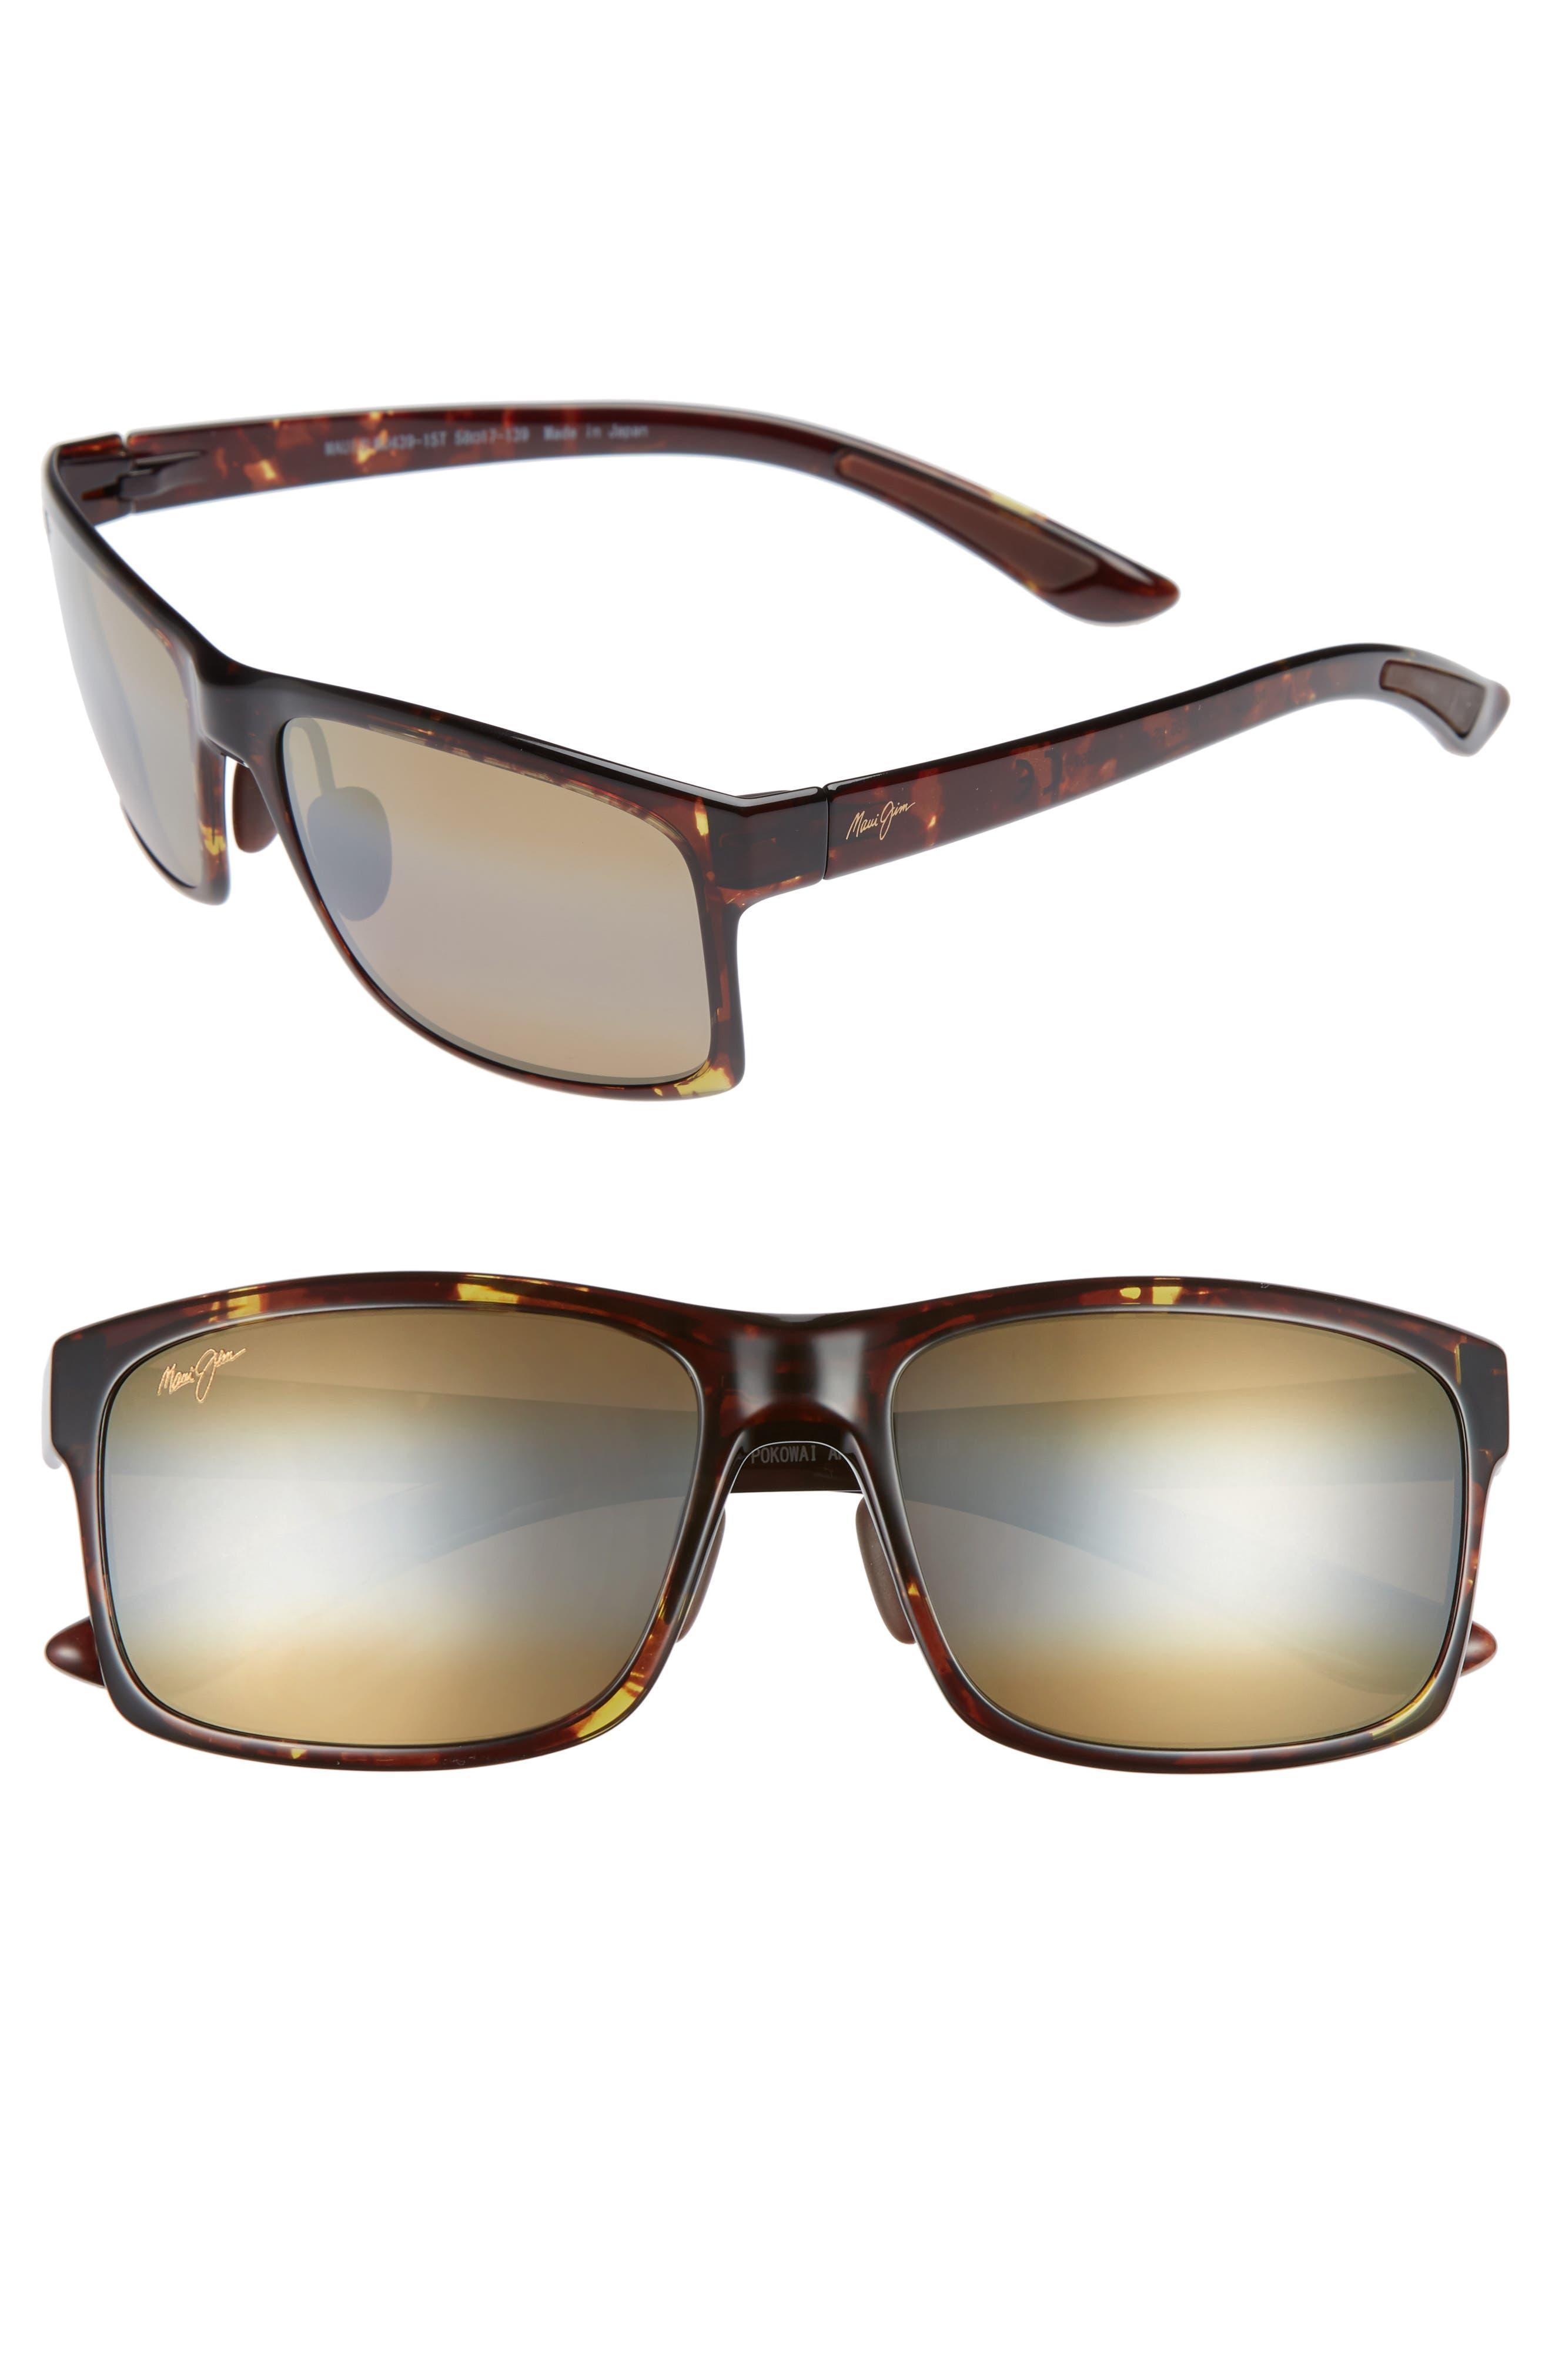 Pokowai Arch 58mm Polarized Sunglasses,                             Main thumbnail 1, color,                             Olive Tortoise/ Bronze